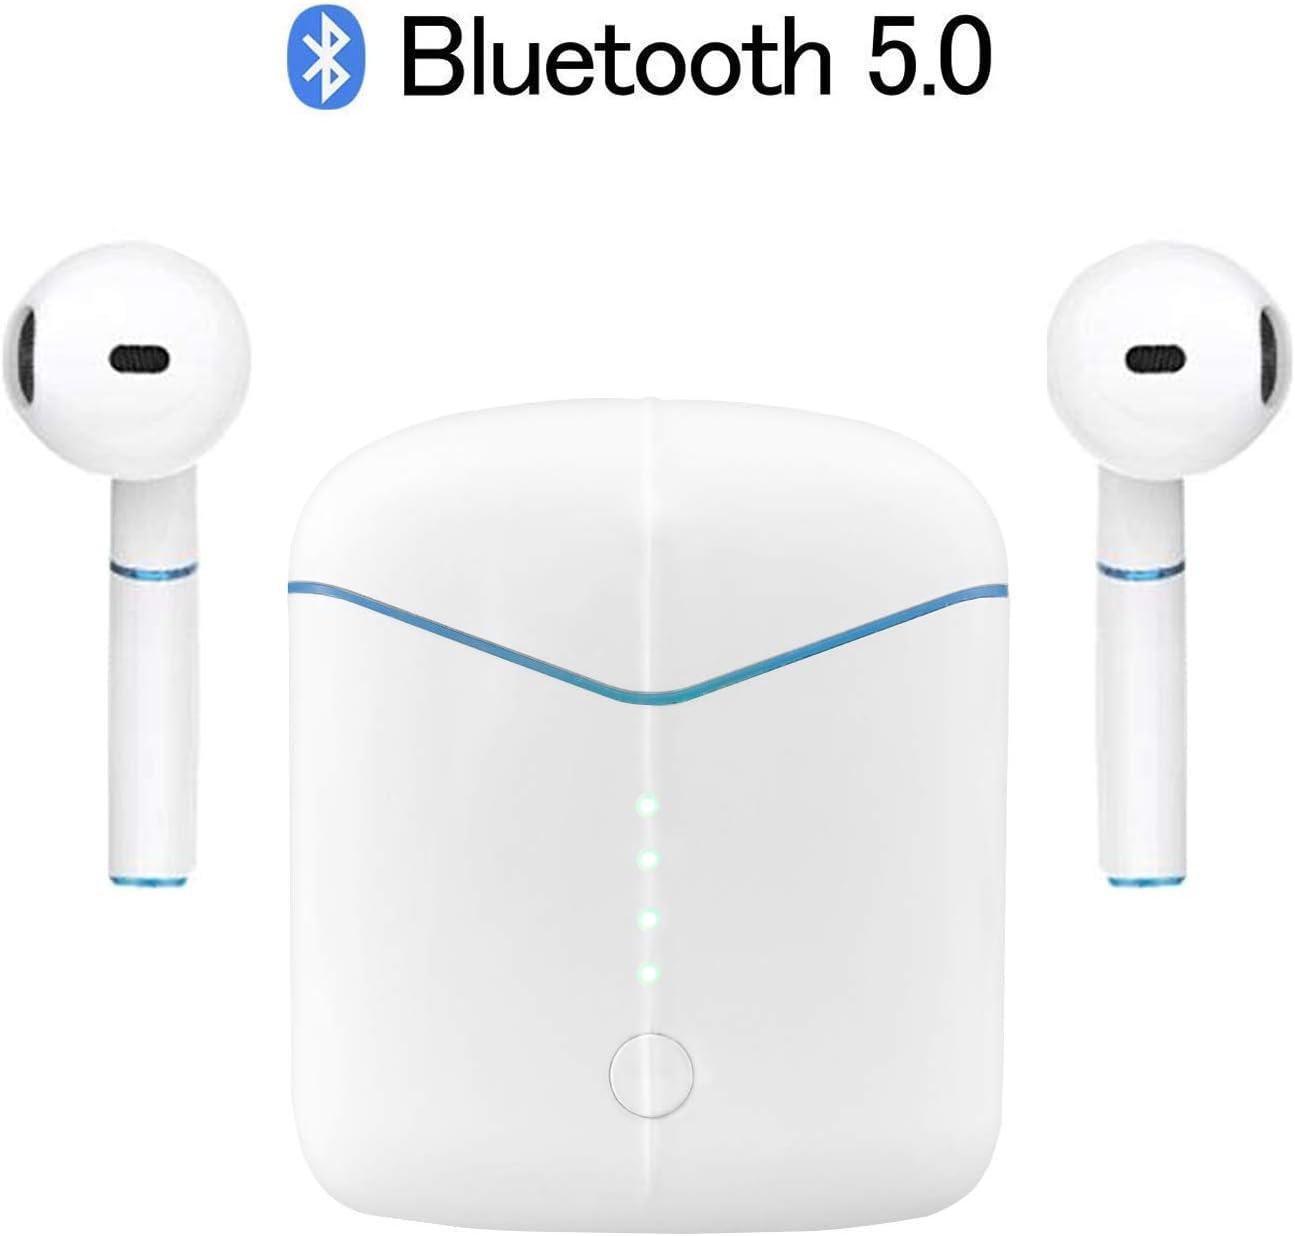 WanshengBL Auriculares Inalambricos Bluetooth 5.0, In Ear Auriculares Bluetooth Deportivos IPX5 Impermeable, 25H Tiempo de Uso,Auriculares con Micrófonos Dual para iOS Android